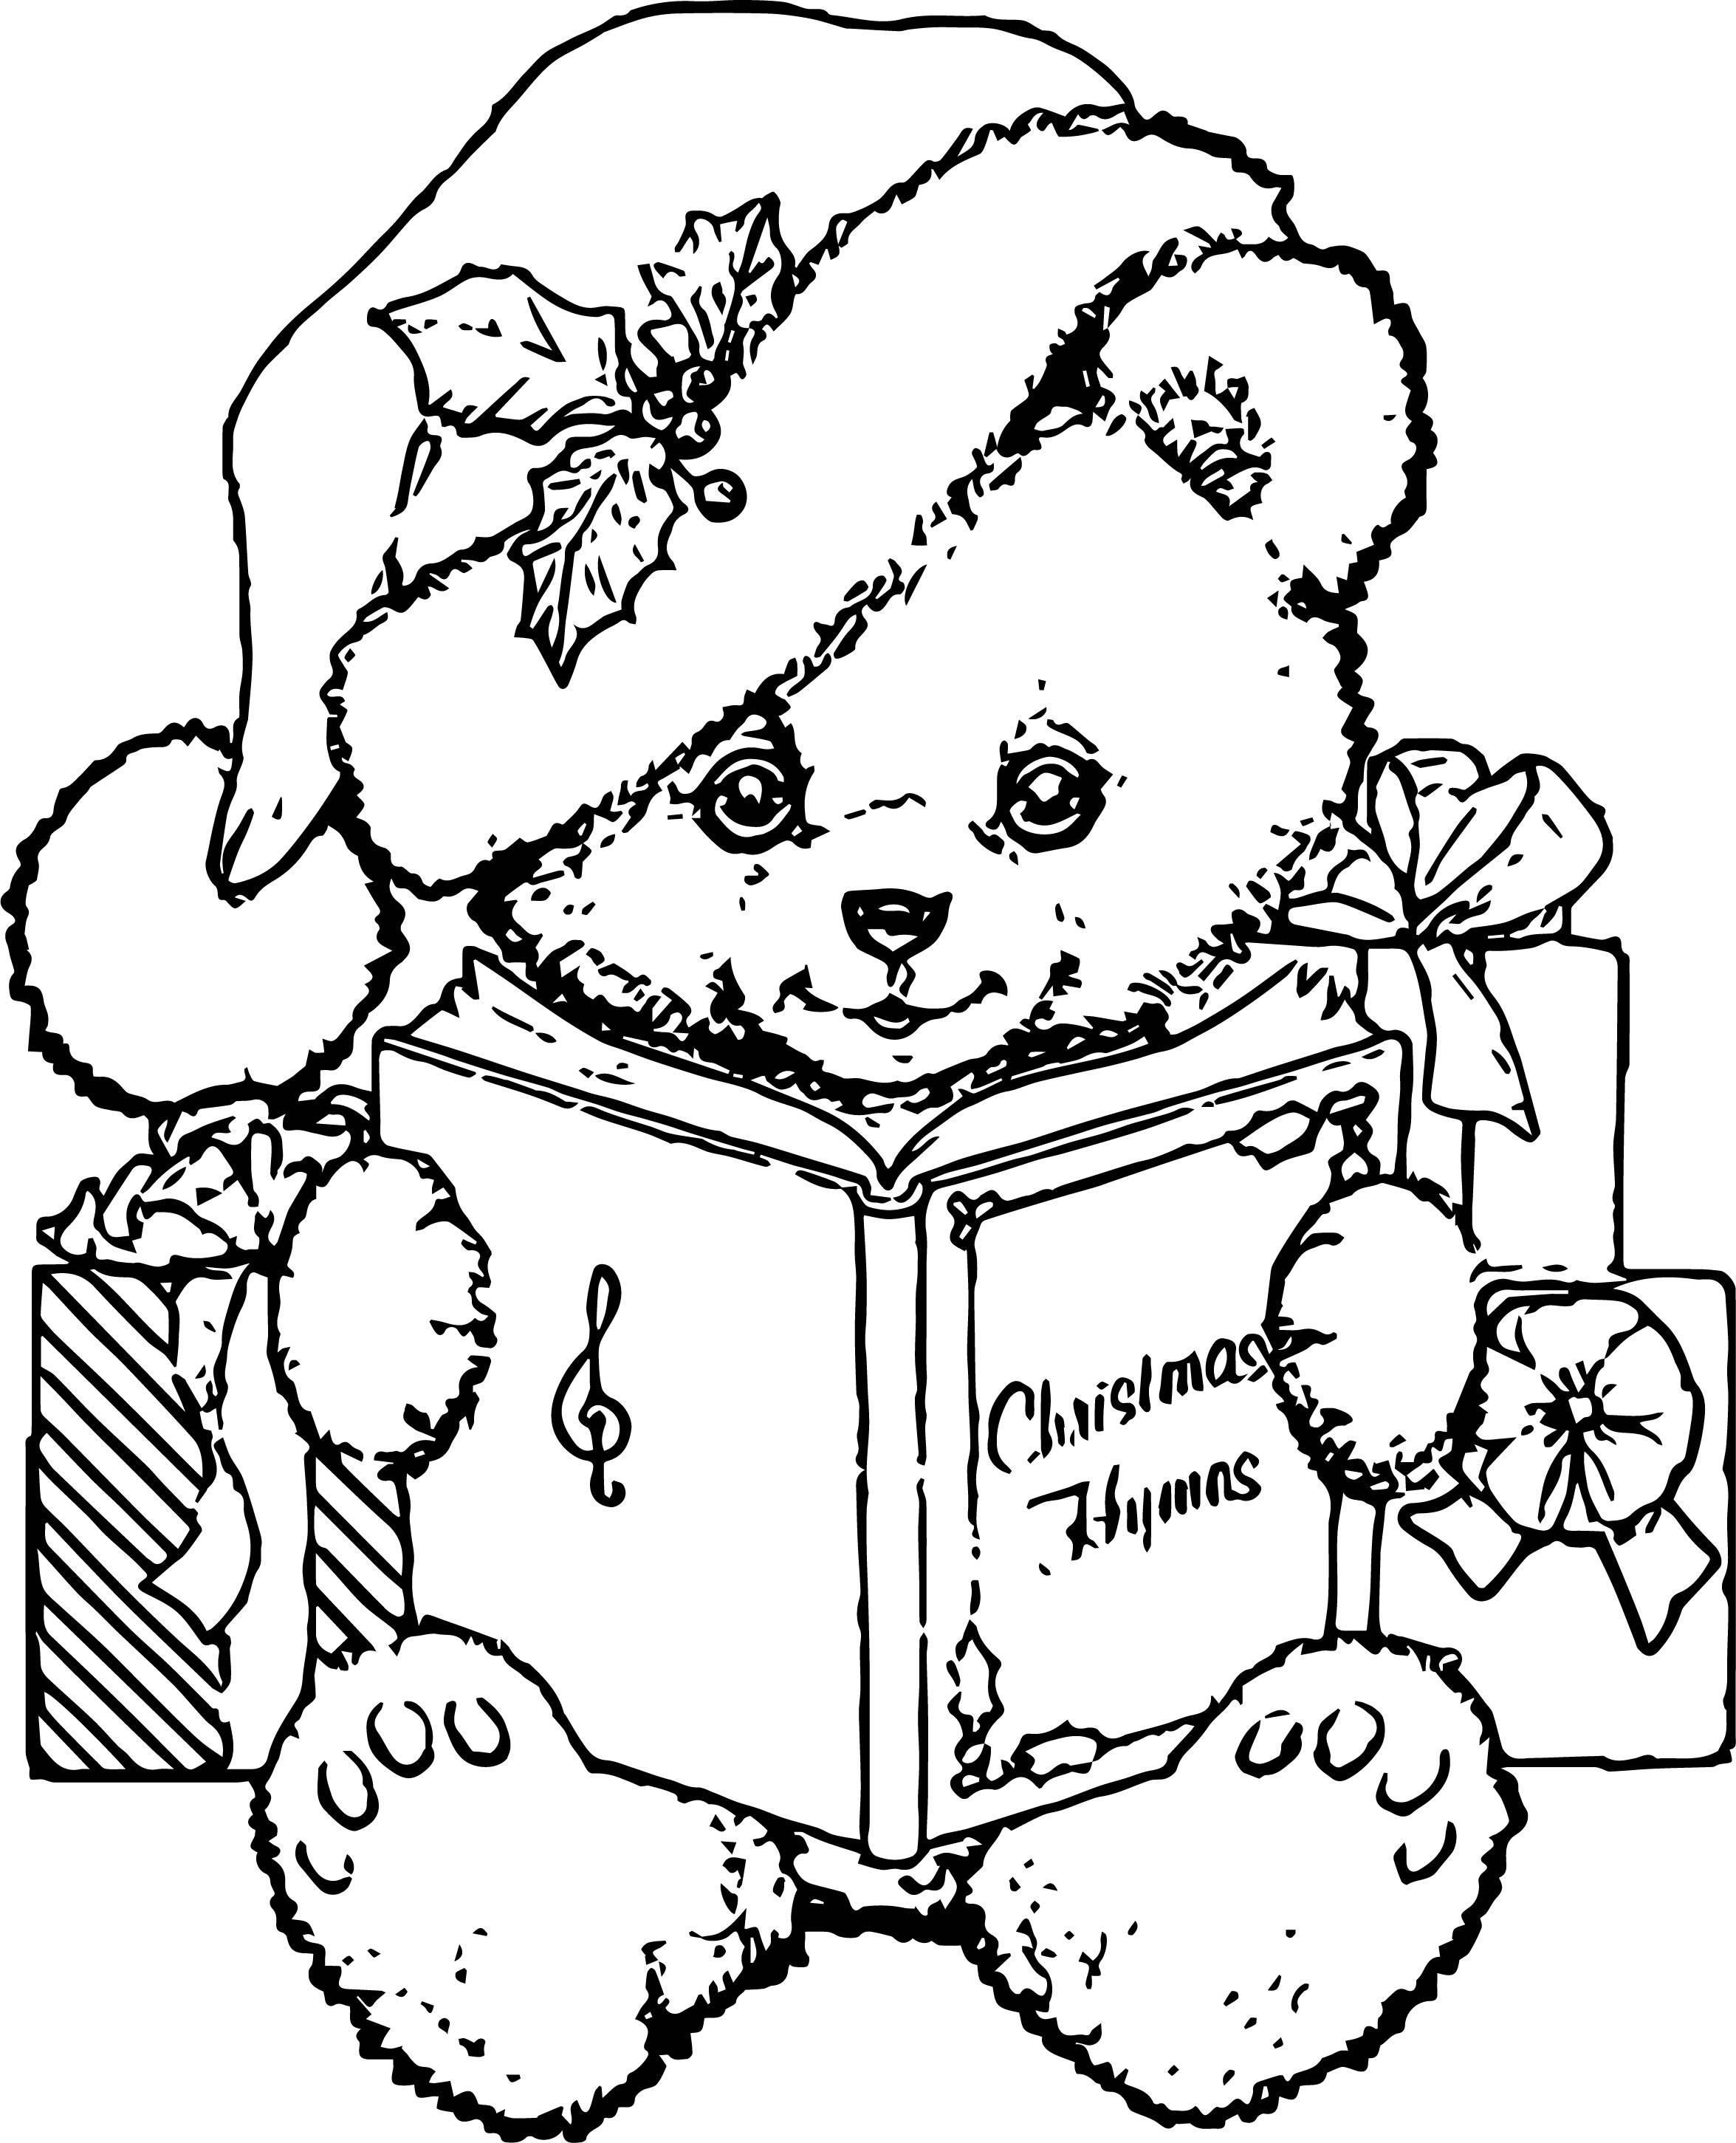 Bear Chrismas Coloring Page